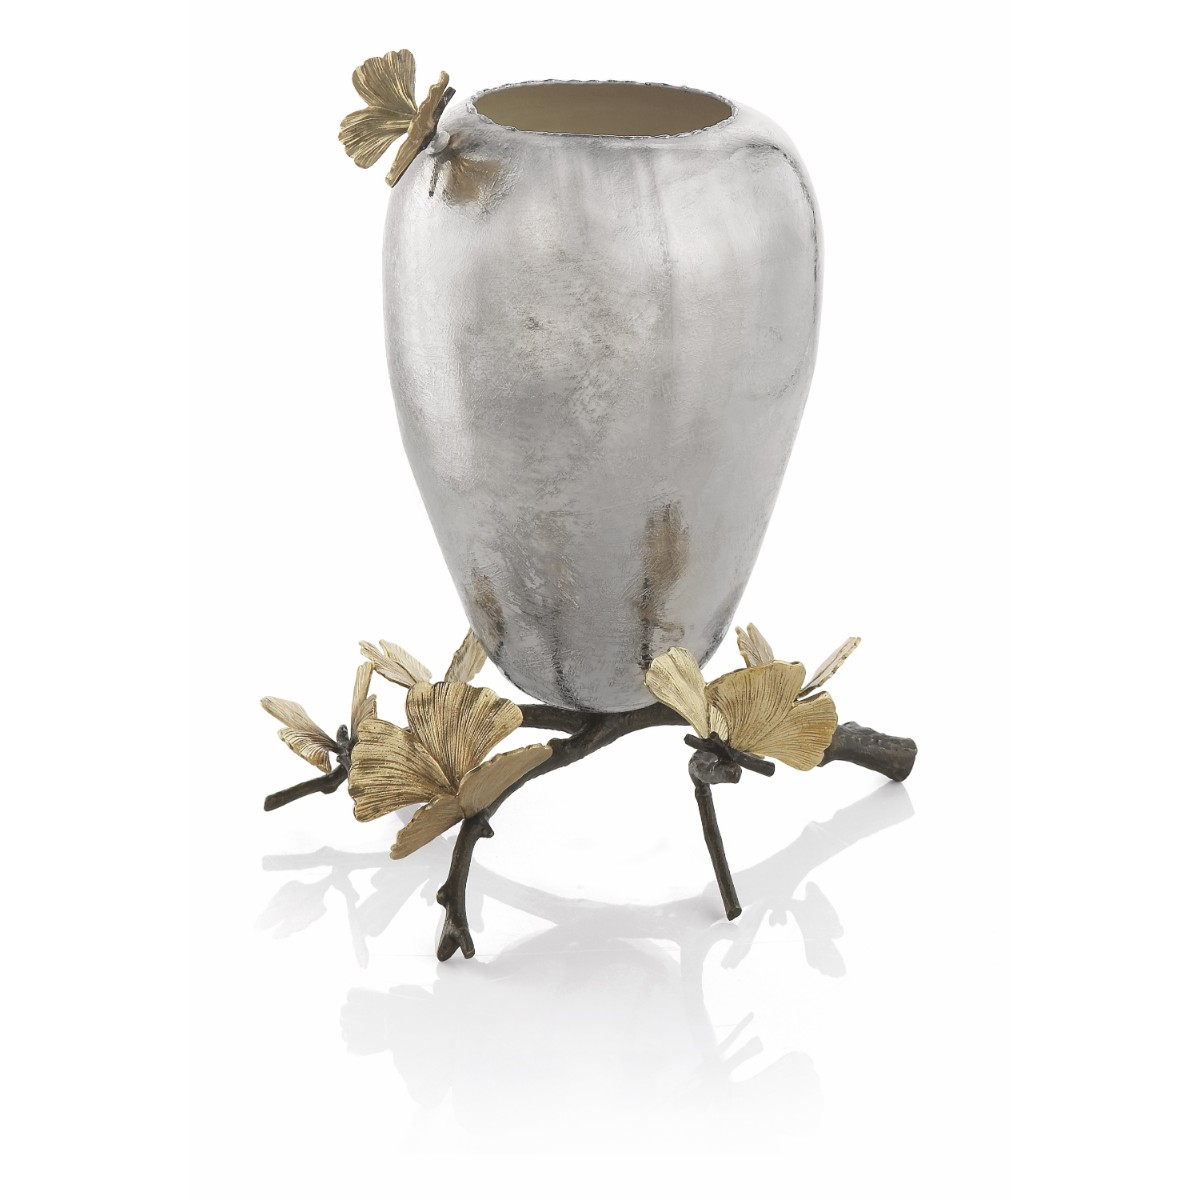 Michael Aram I Butterfly Ginkgo Vase